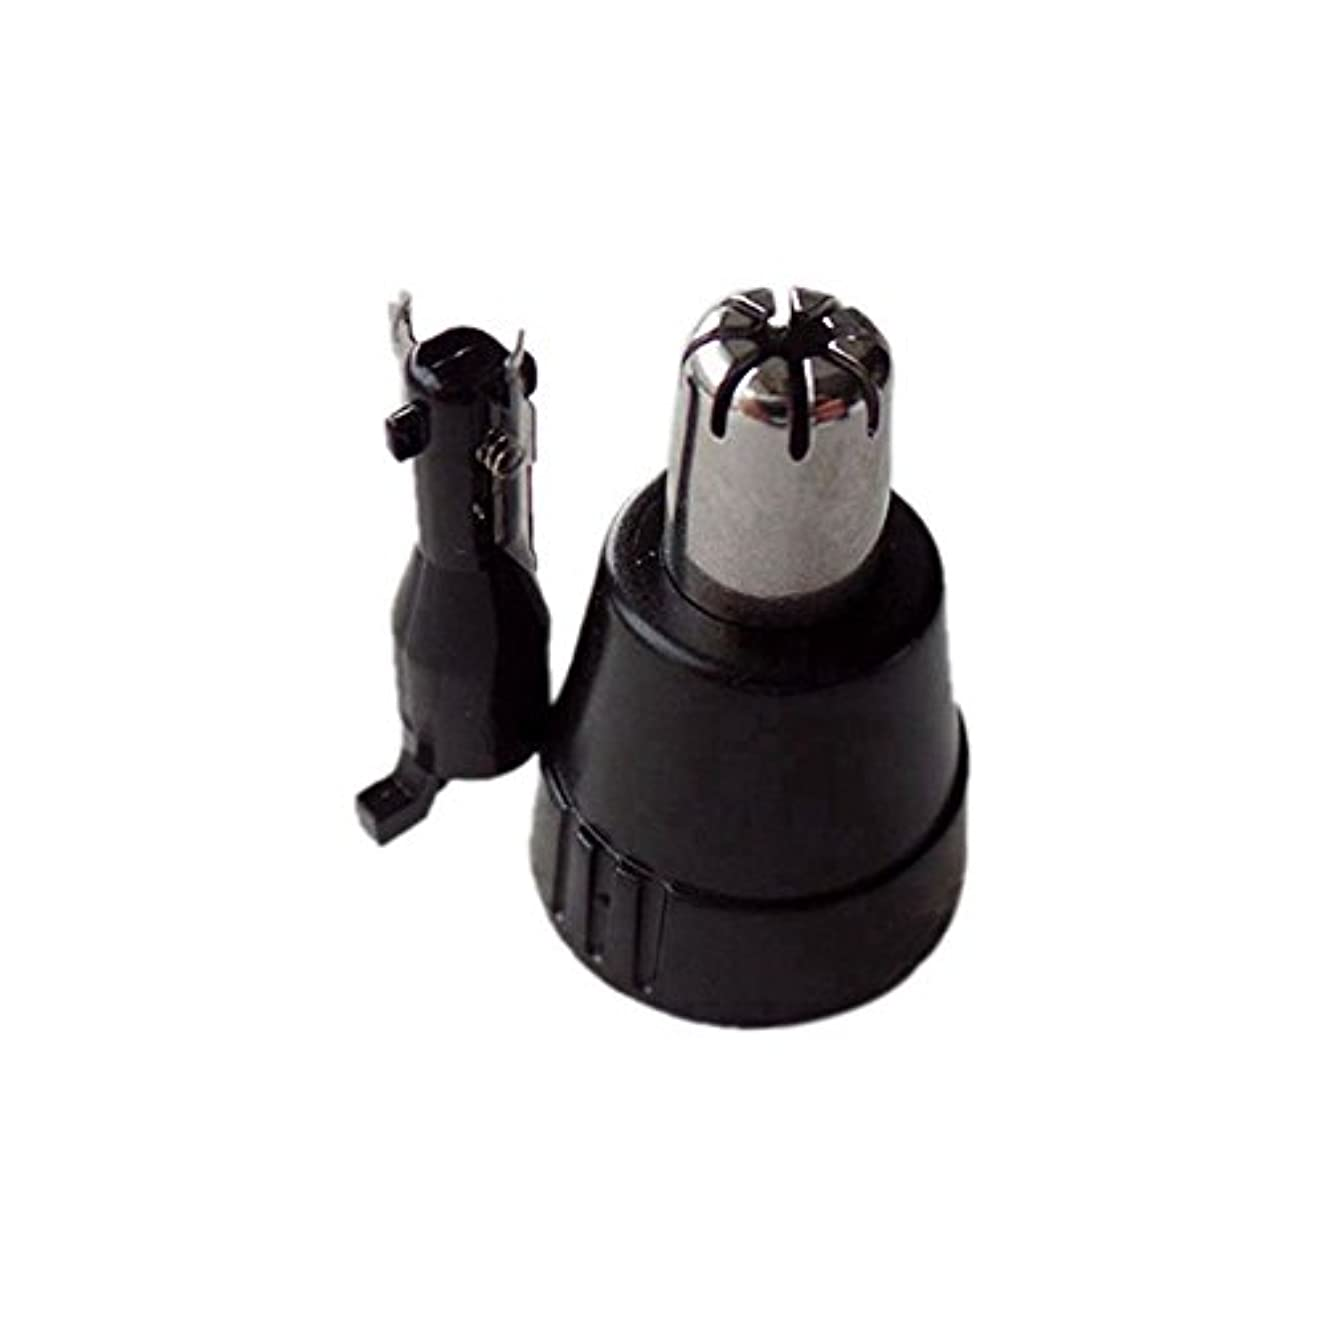 Deylaying 鼻毛カッター替刃 パーツ 内刃 外刃 耐用 高質量 for Panasonic 鼻毛カッター ER-GN30/-GN10